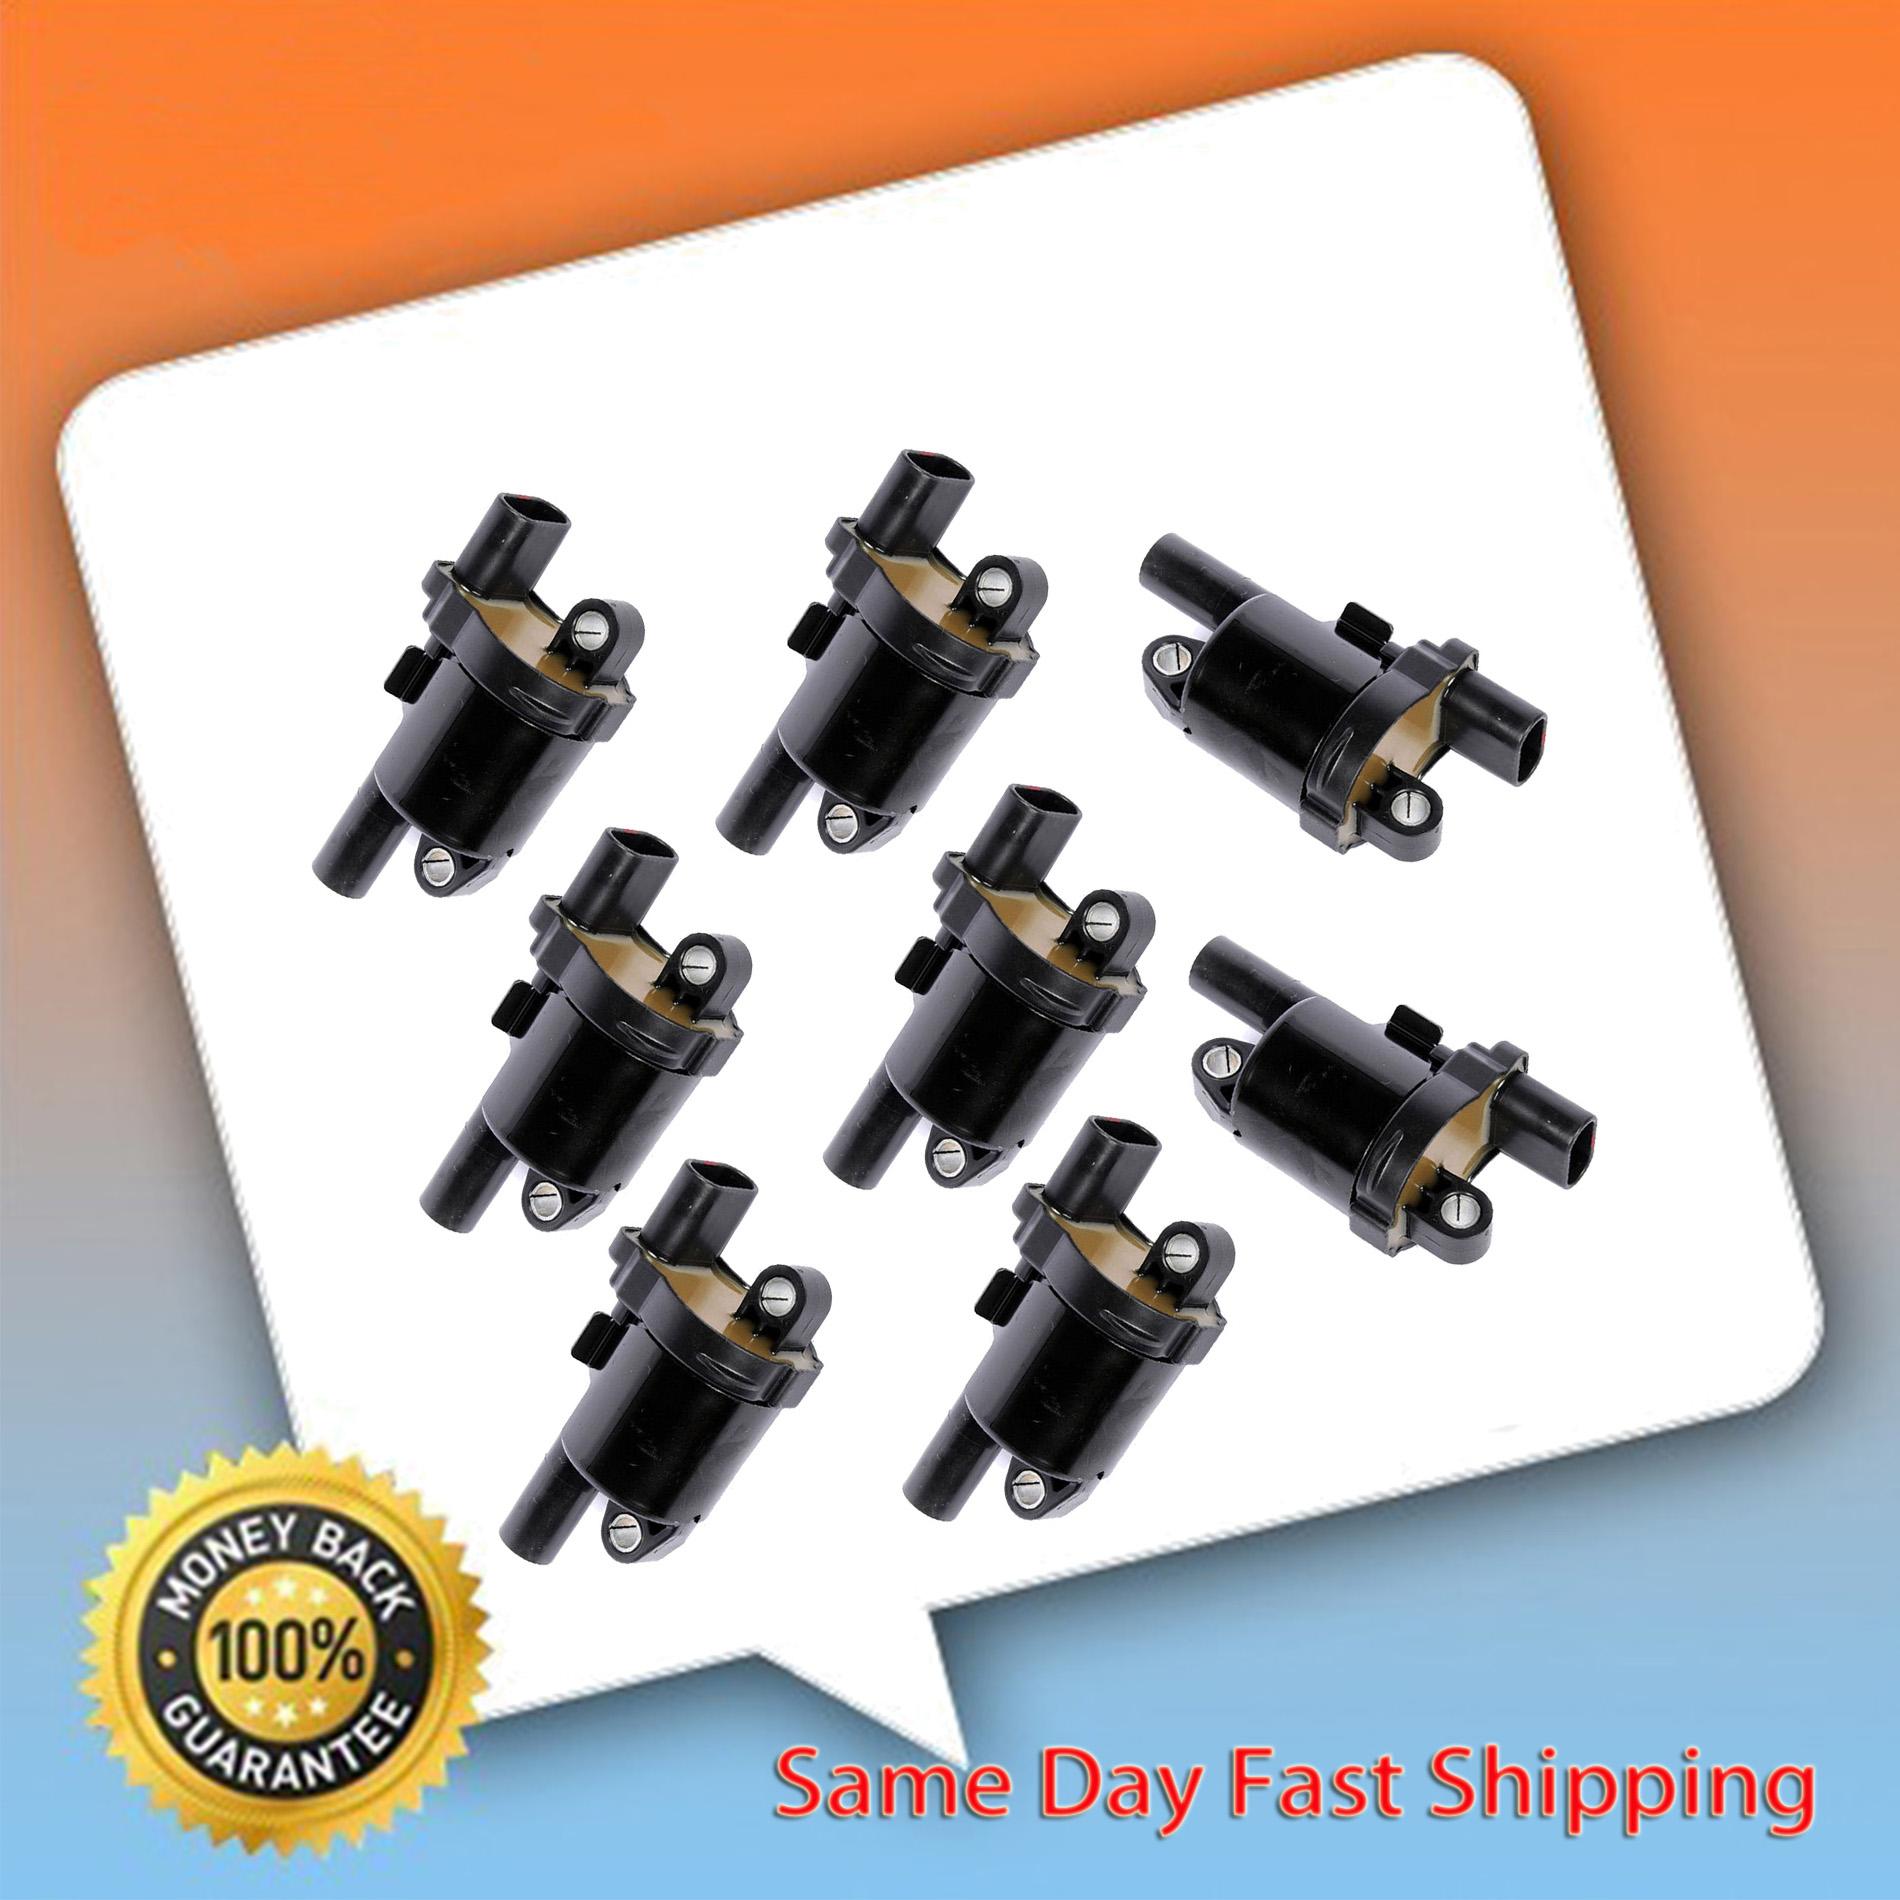 For GMC Chevrolet Cadillac 4.3L 5.3L 6.2L 12658183 Ignition Coil B2953